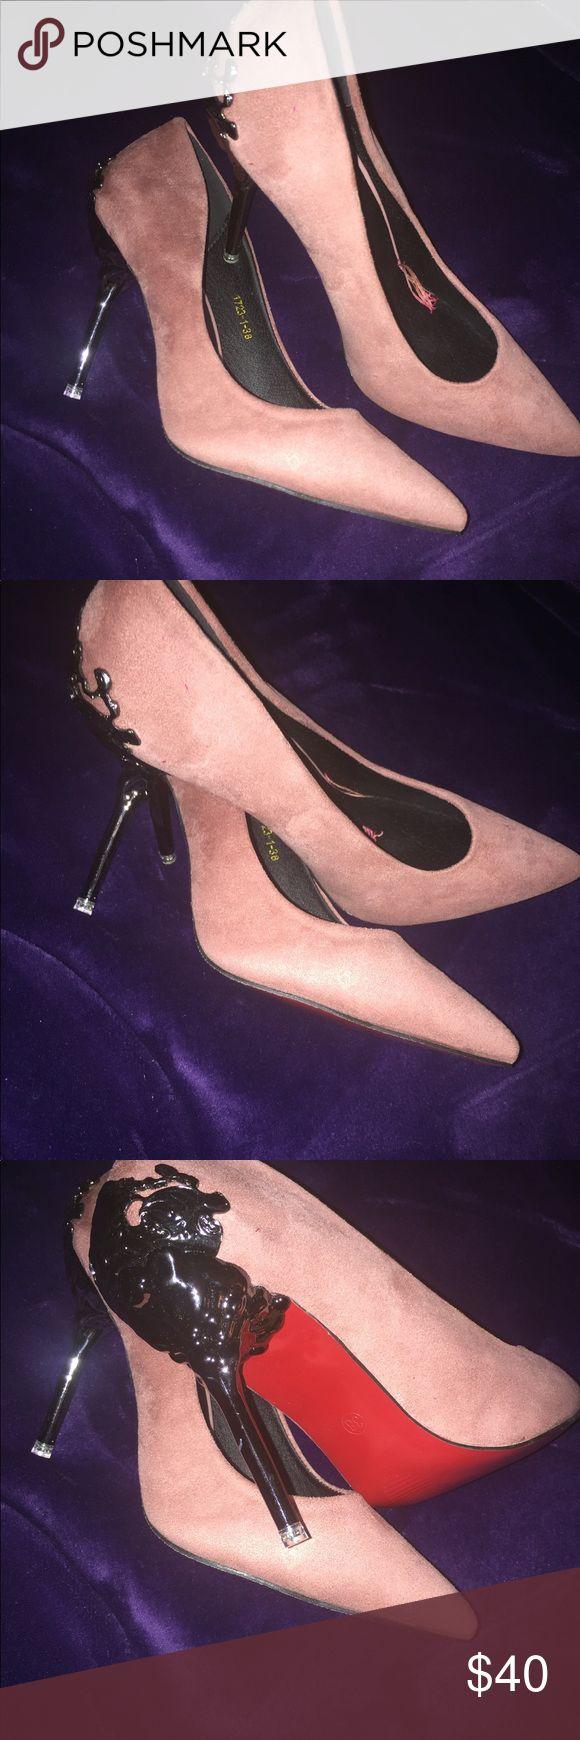 Gorg! Blush Pink Suede Heels NWOT Boutique Gorg! Blush Pink Suede Heels. Beautiful Red Painted Soles. Ornate detail on heels. Shoes Heels